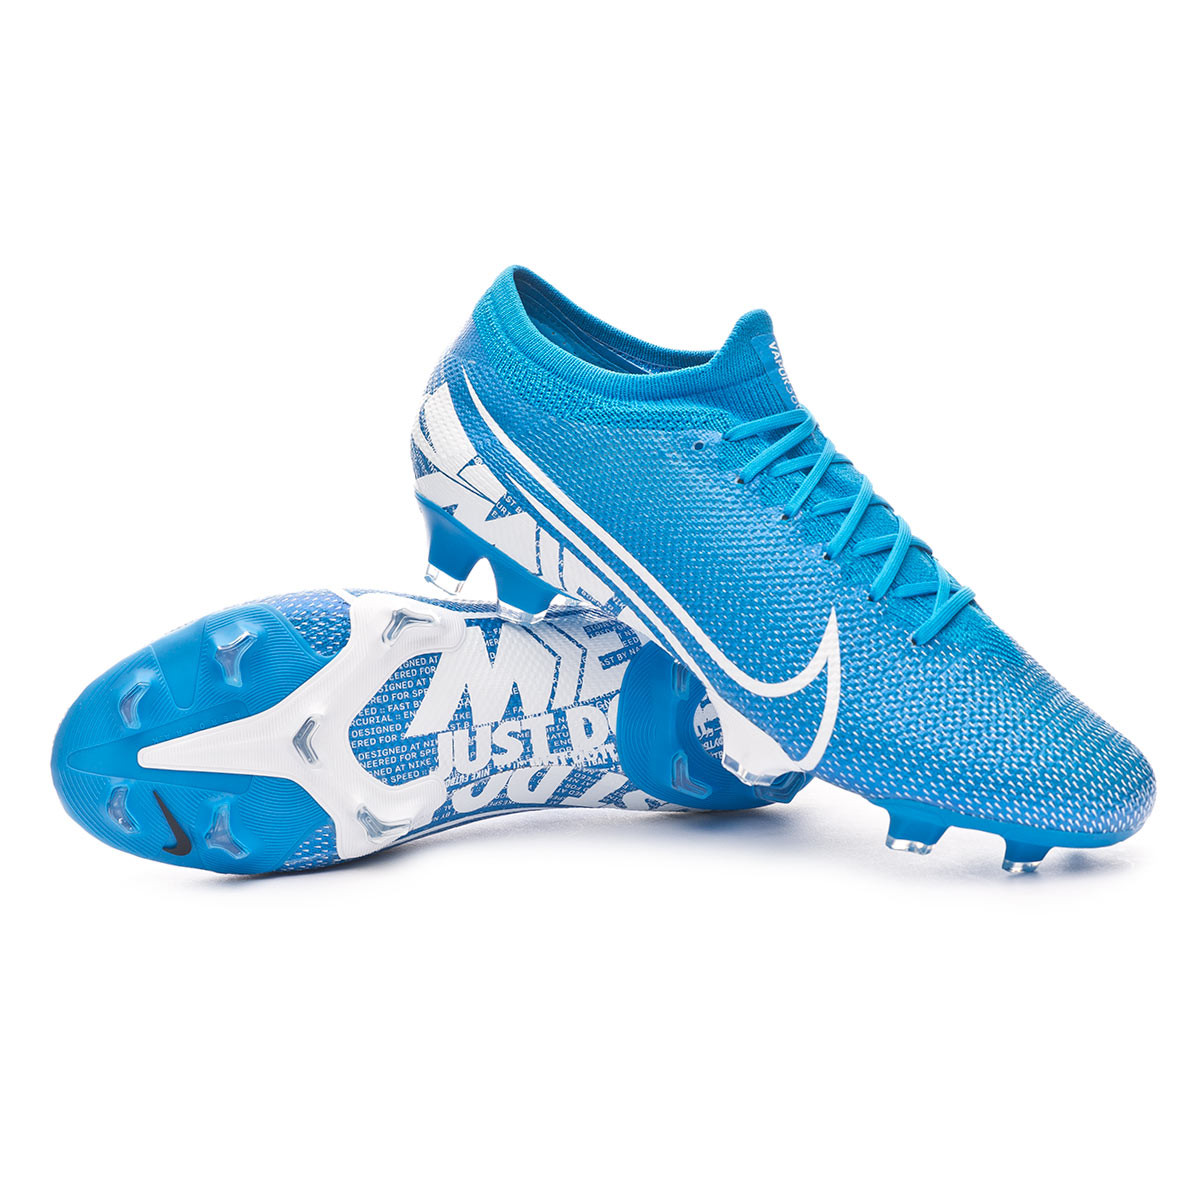 Nike Mercurial Vapor XIII Pro FG Football Boots